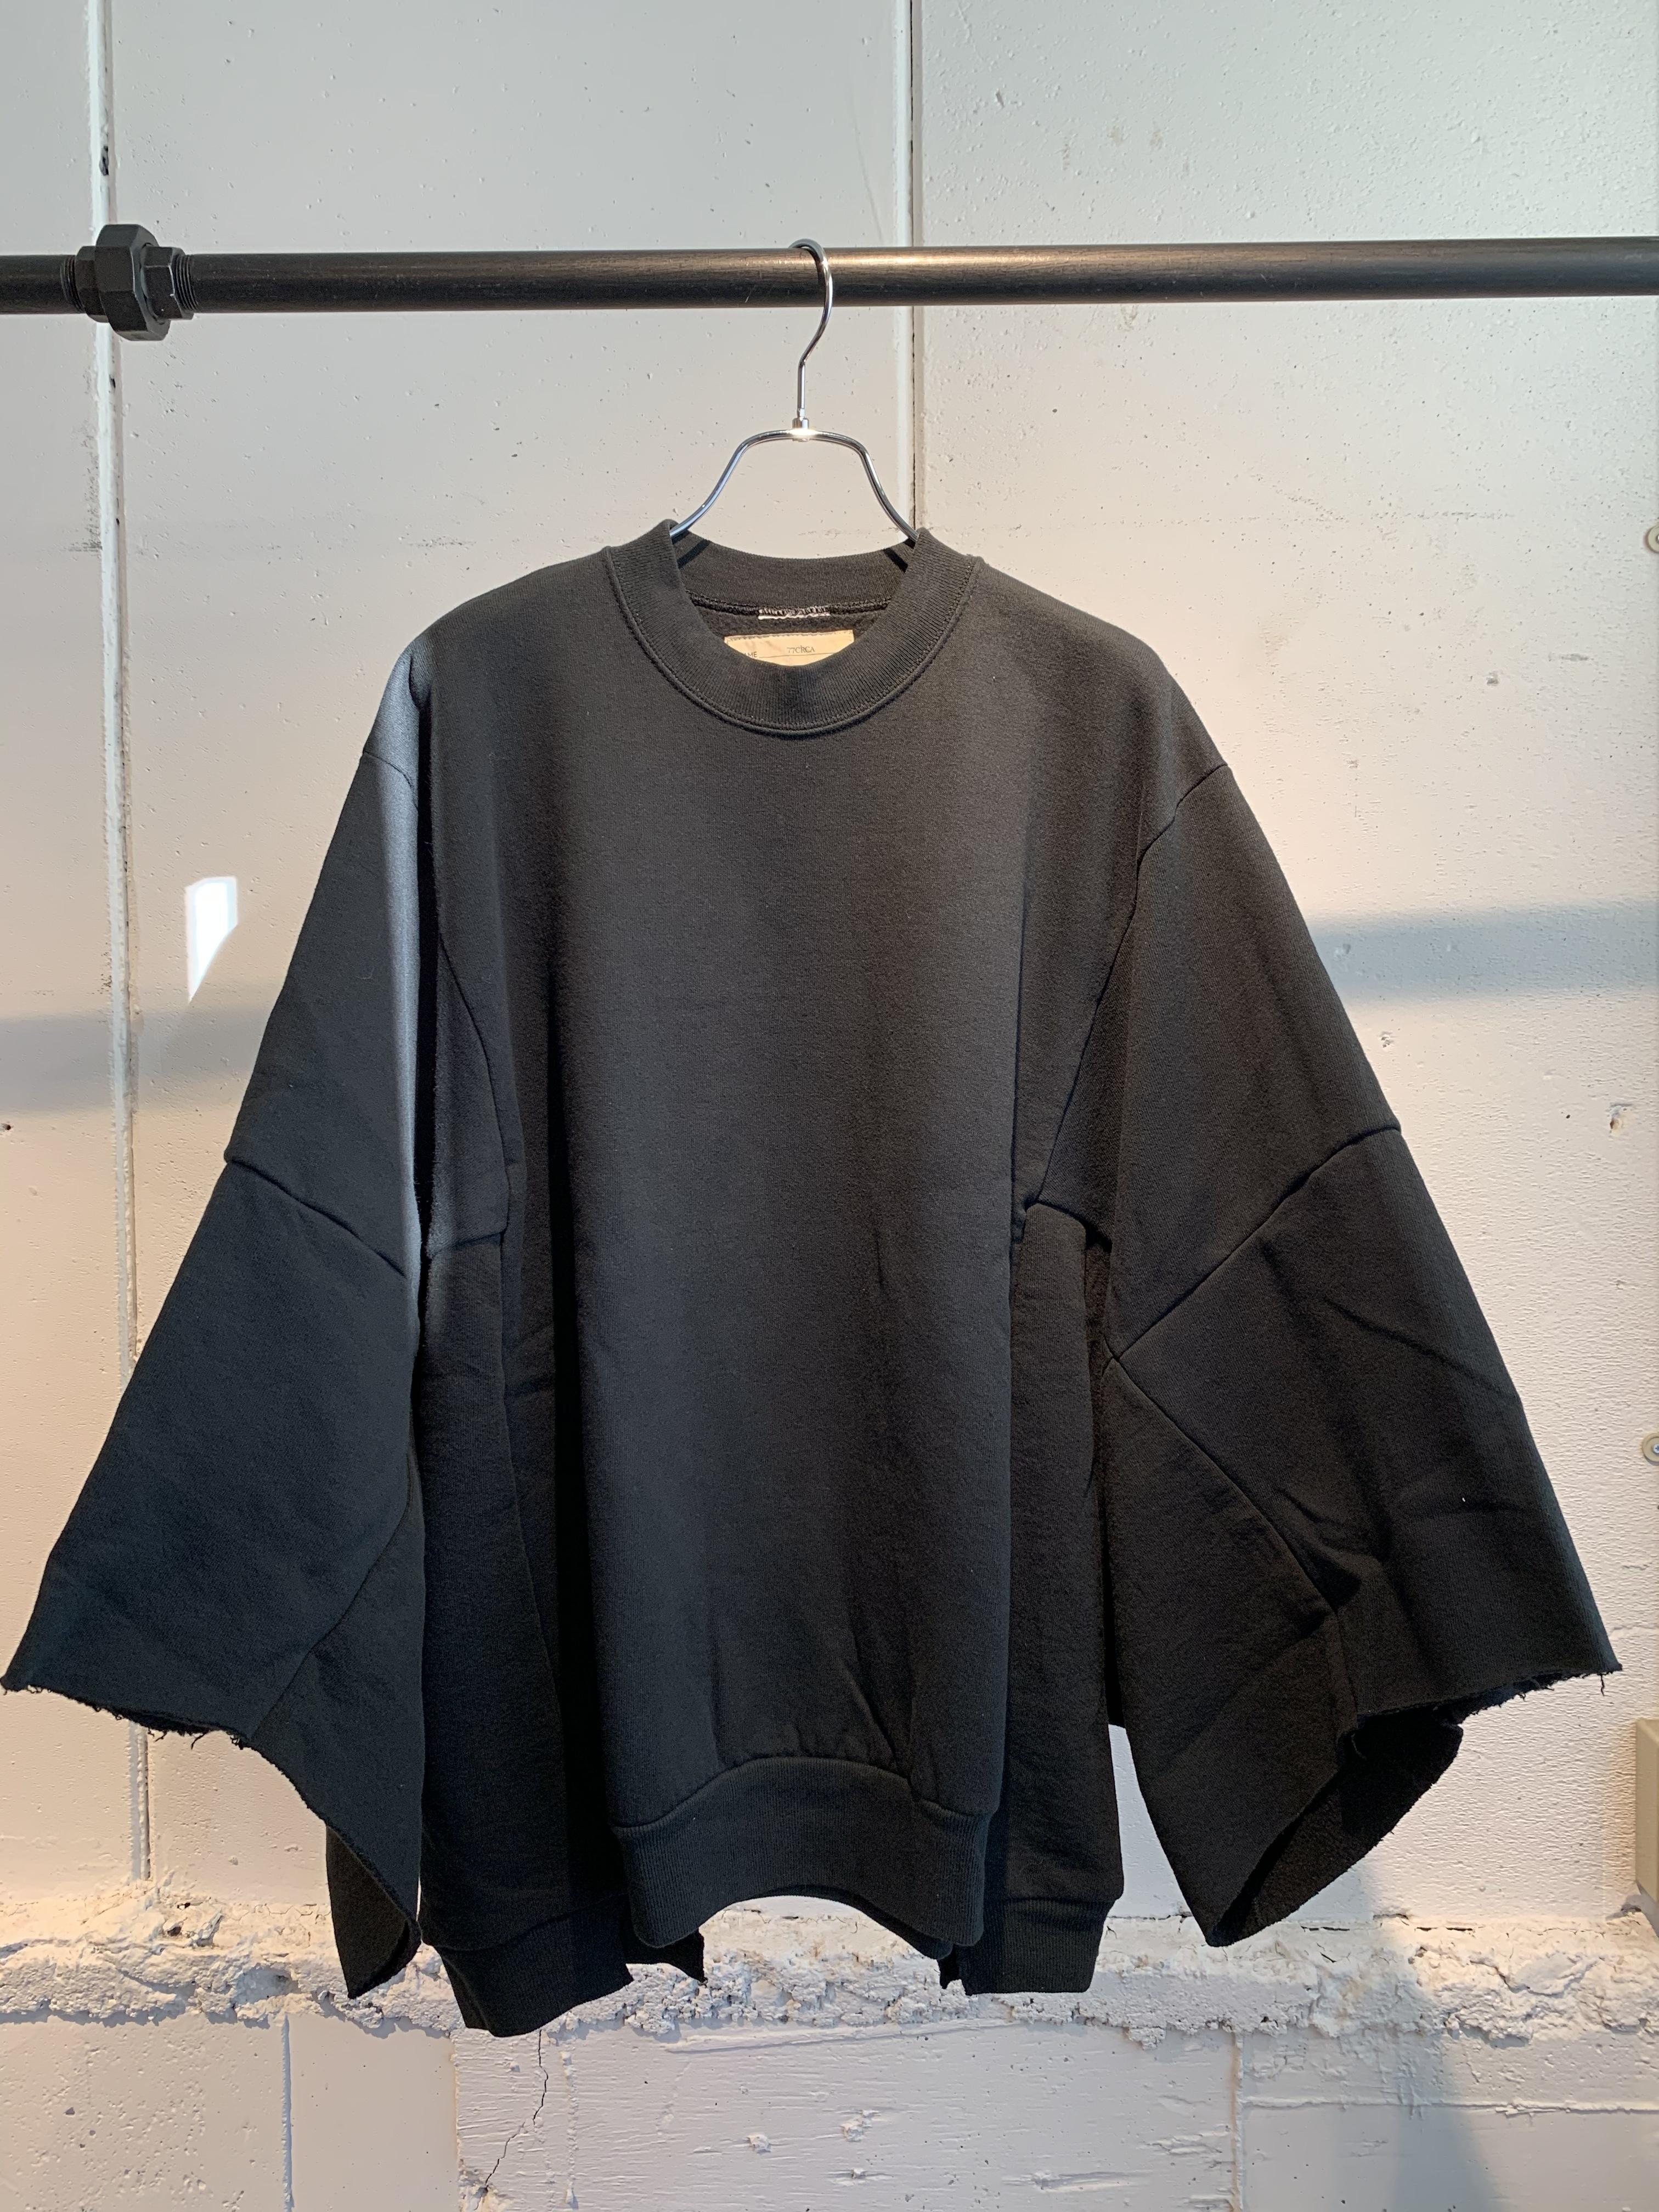 77CIRCA circa make wide set in short sleeve sweat top (Black) ②